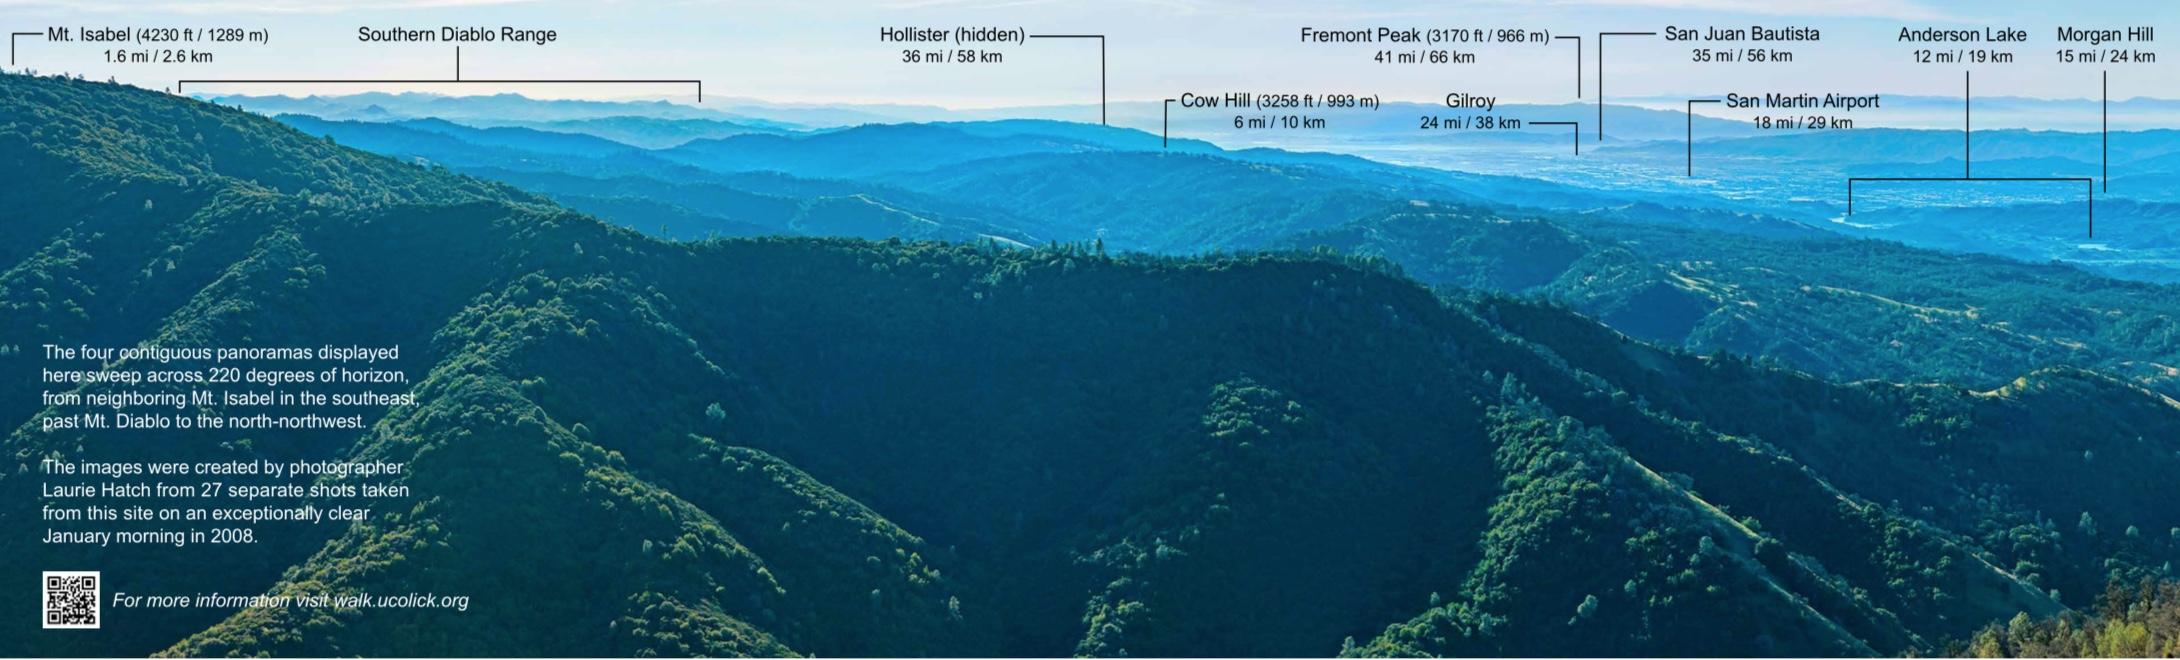 Panoramic Views: Southern View